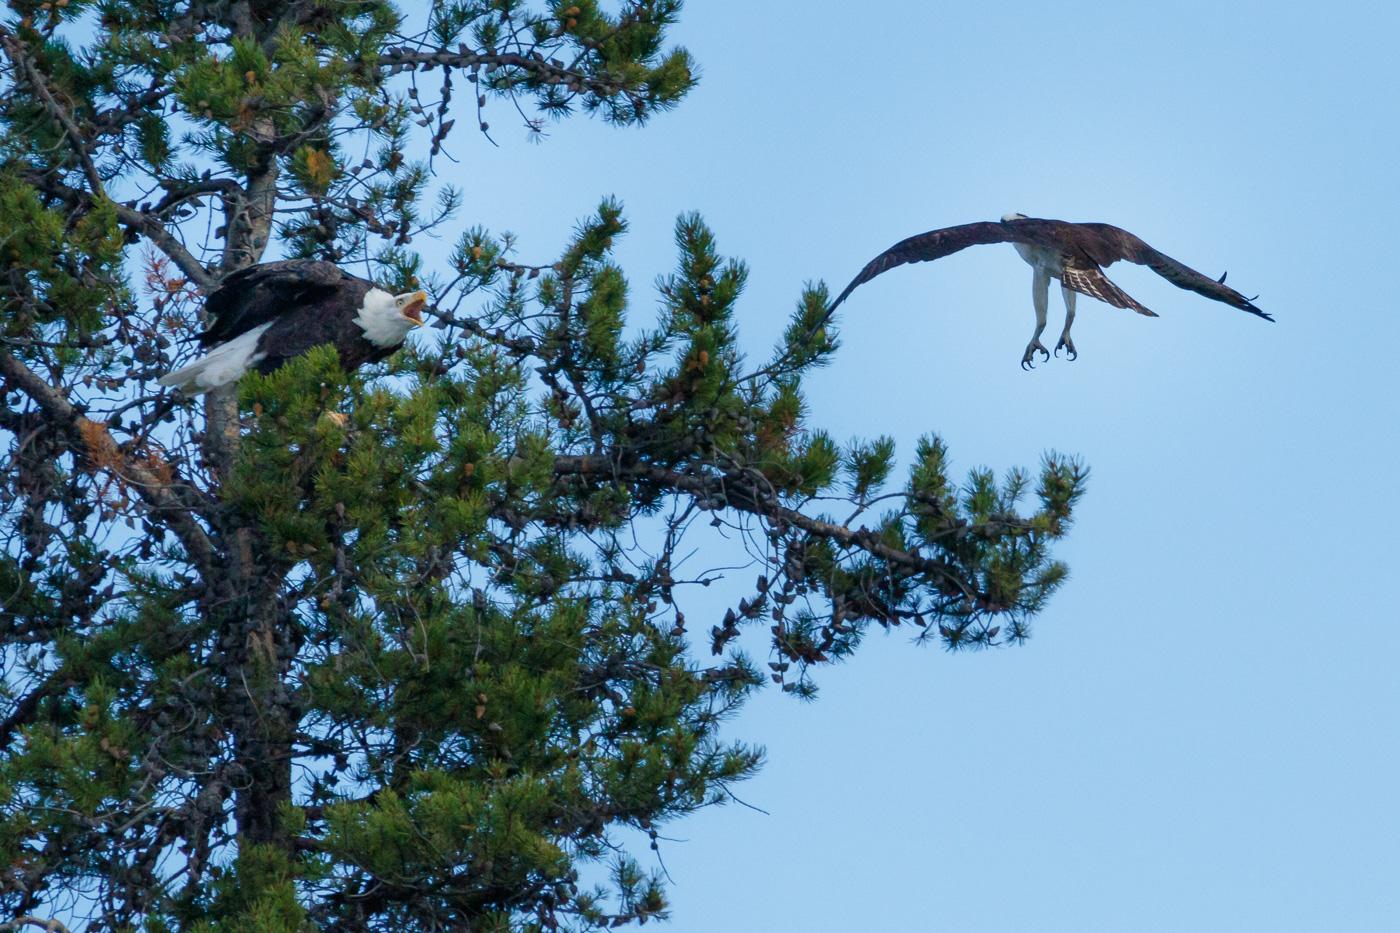 A bald Eagle (Haliaeetus lecocephalus) and an osprey (Pandion haliaetus), Grand Teton National Park, U.S.A. - Fauna de Nord-Amèrica - Raül Carmona - Fotografia, Fotografia d'estudi, esdeveniments i Natura